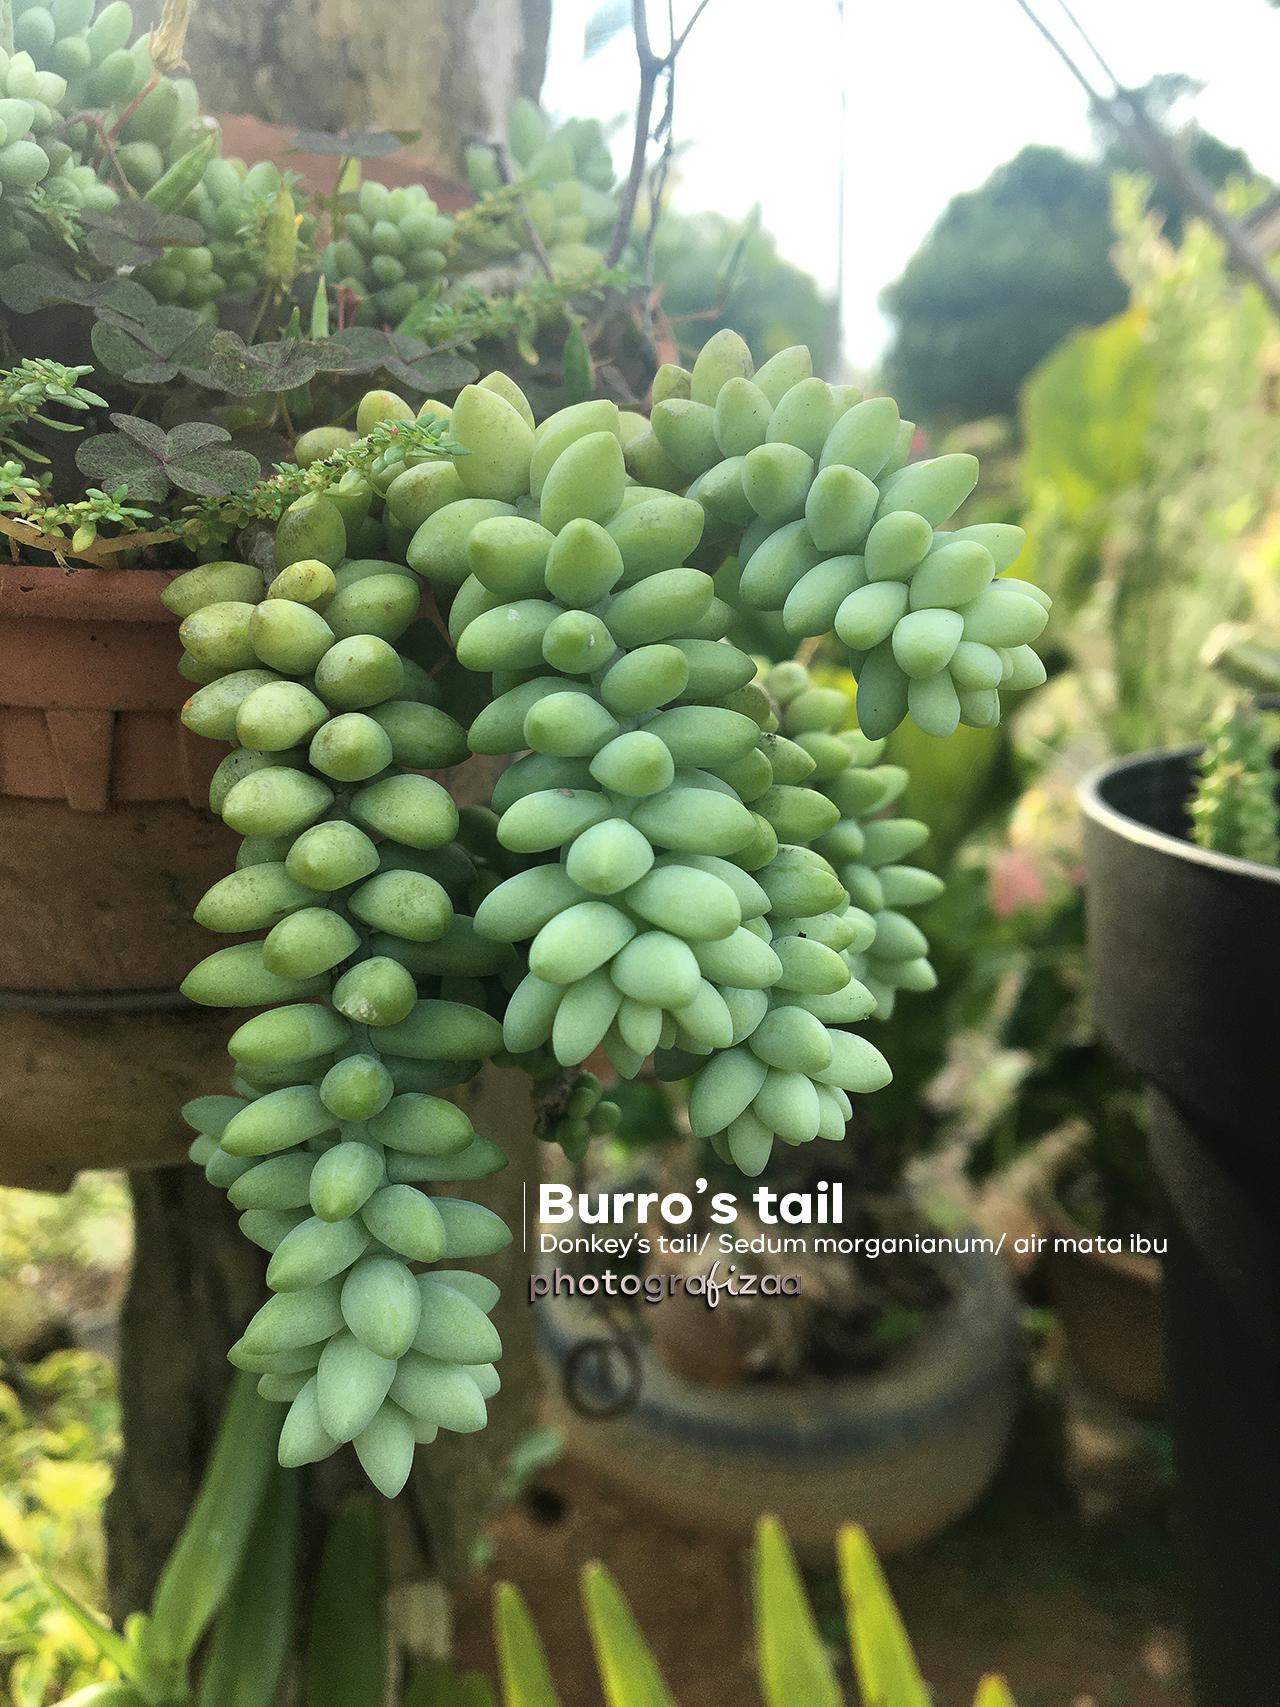 Pokok air mata ibu/Burro's tail